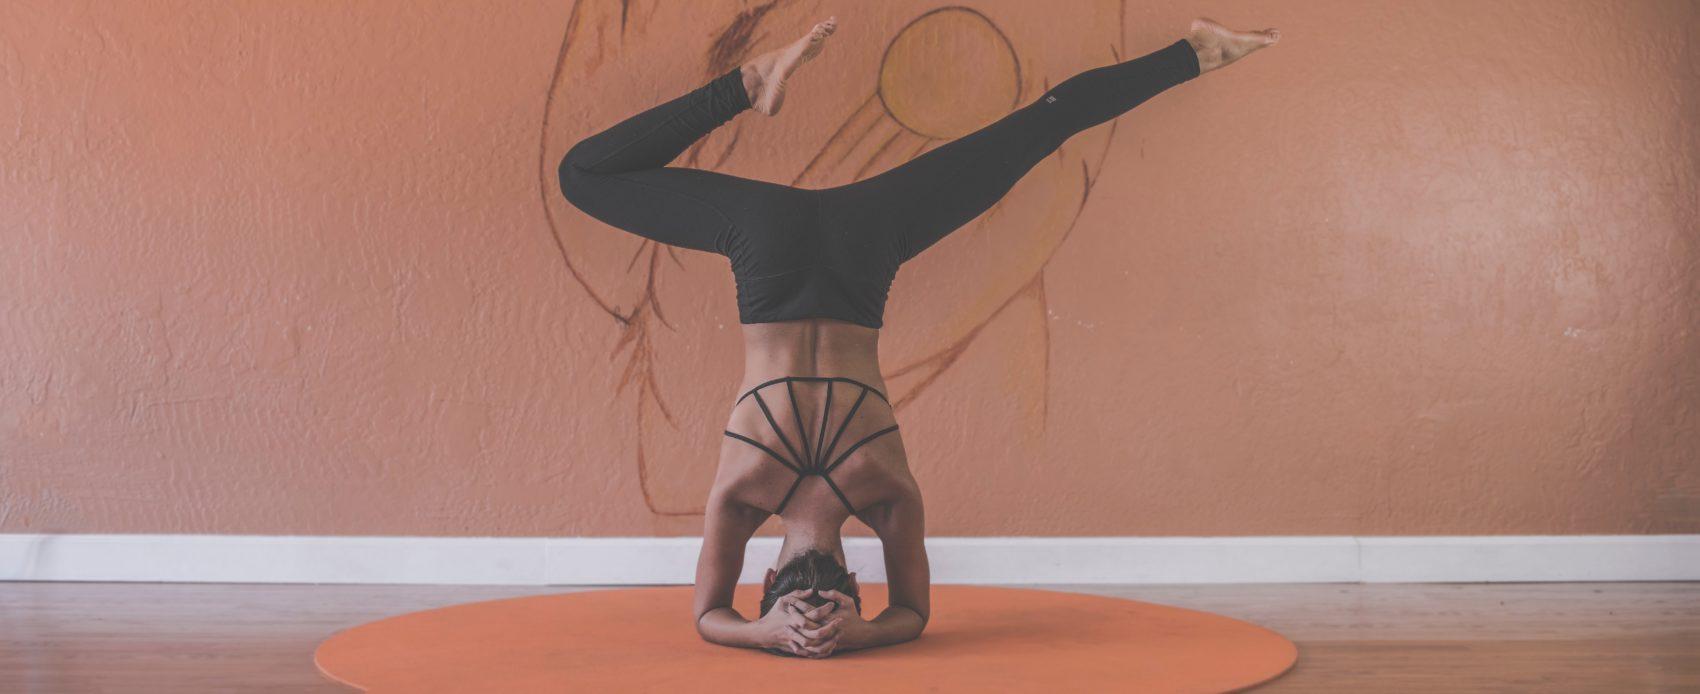 CBD for yoga workouts